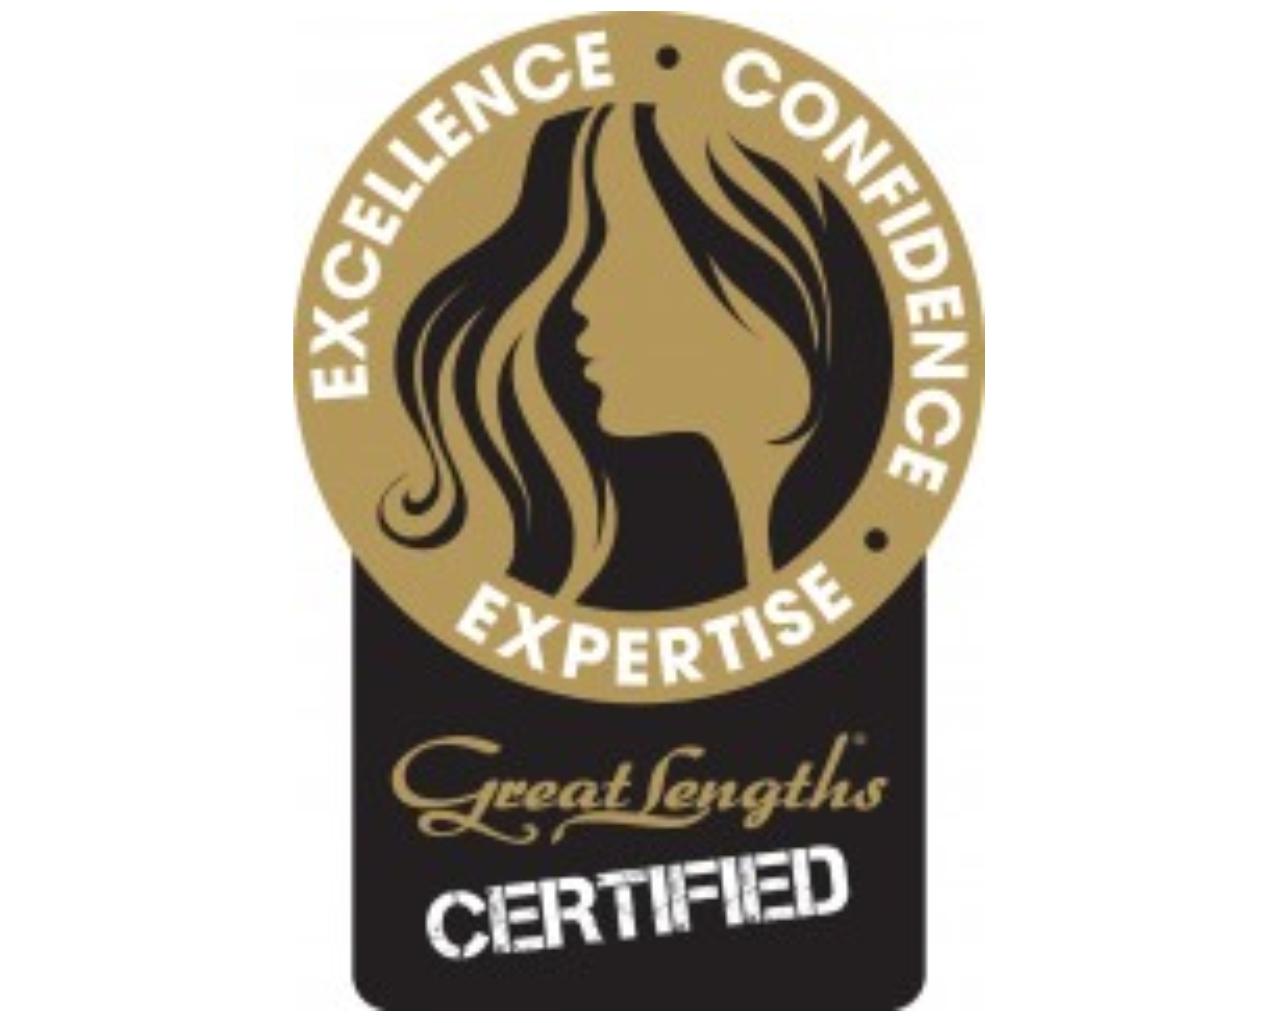 HILLARY SMALL CERTIFIED HILLARY LOVES HAIR HAIR SALON ASHEVILLE NC GREAT LENGTHS HAIR EXTENSIONS KERATIN BONDS